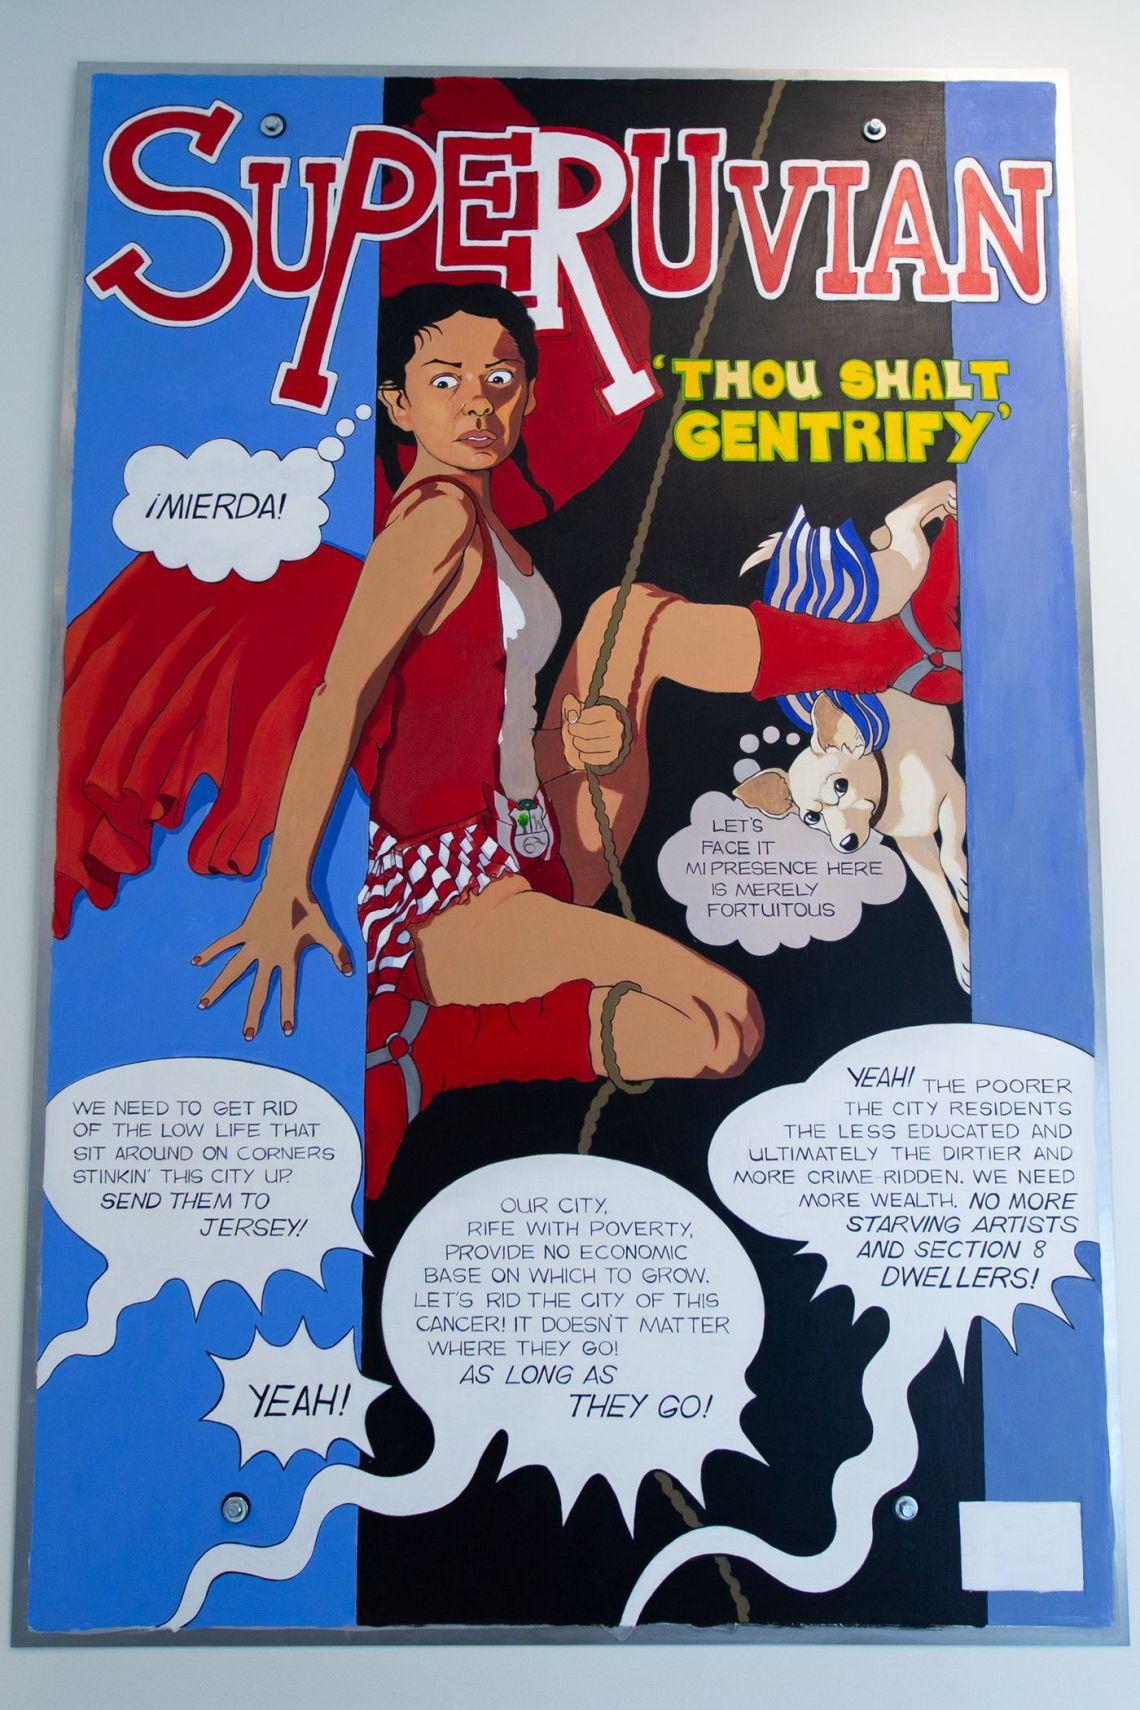 An anti-gentrification painting by Kukuli Velarde on display at Taller Puertorriqueño.